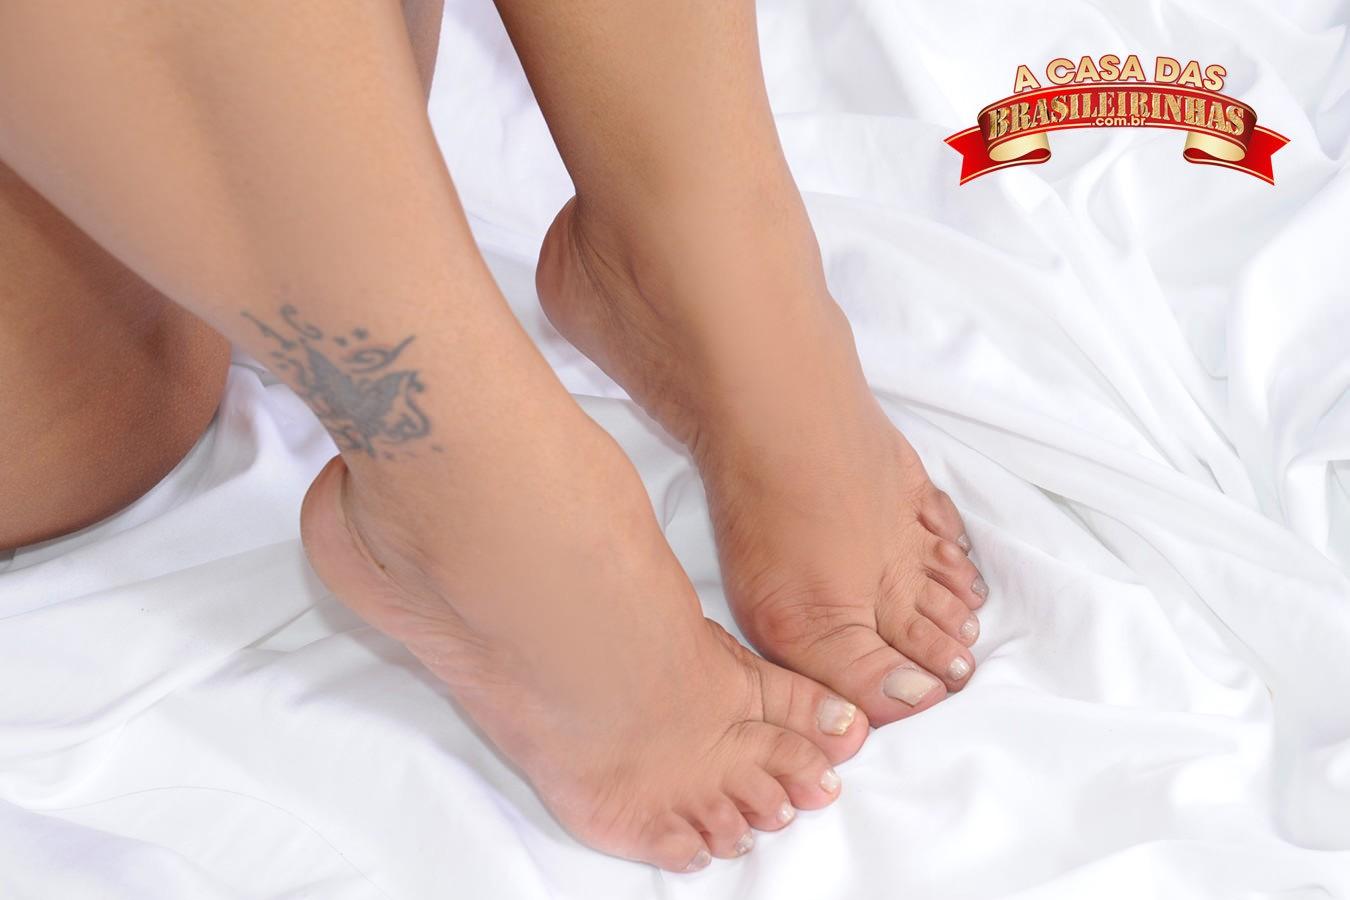 pés-da-Alessandra-Marques.jpg